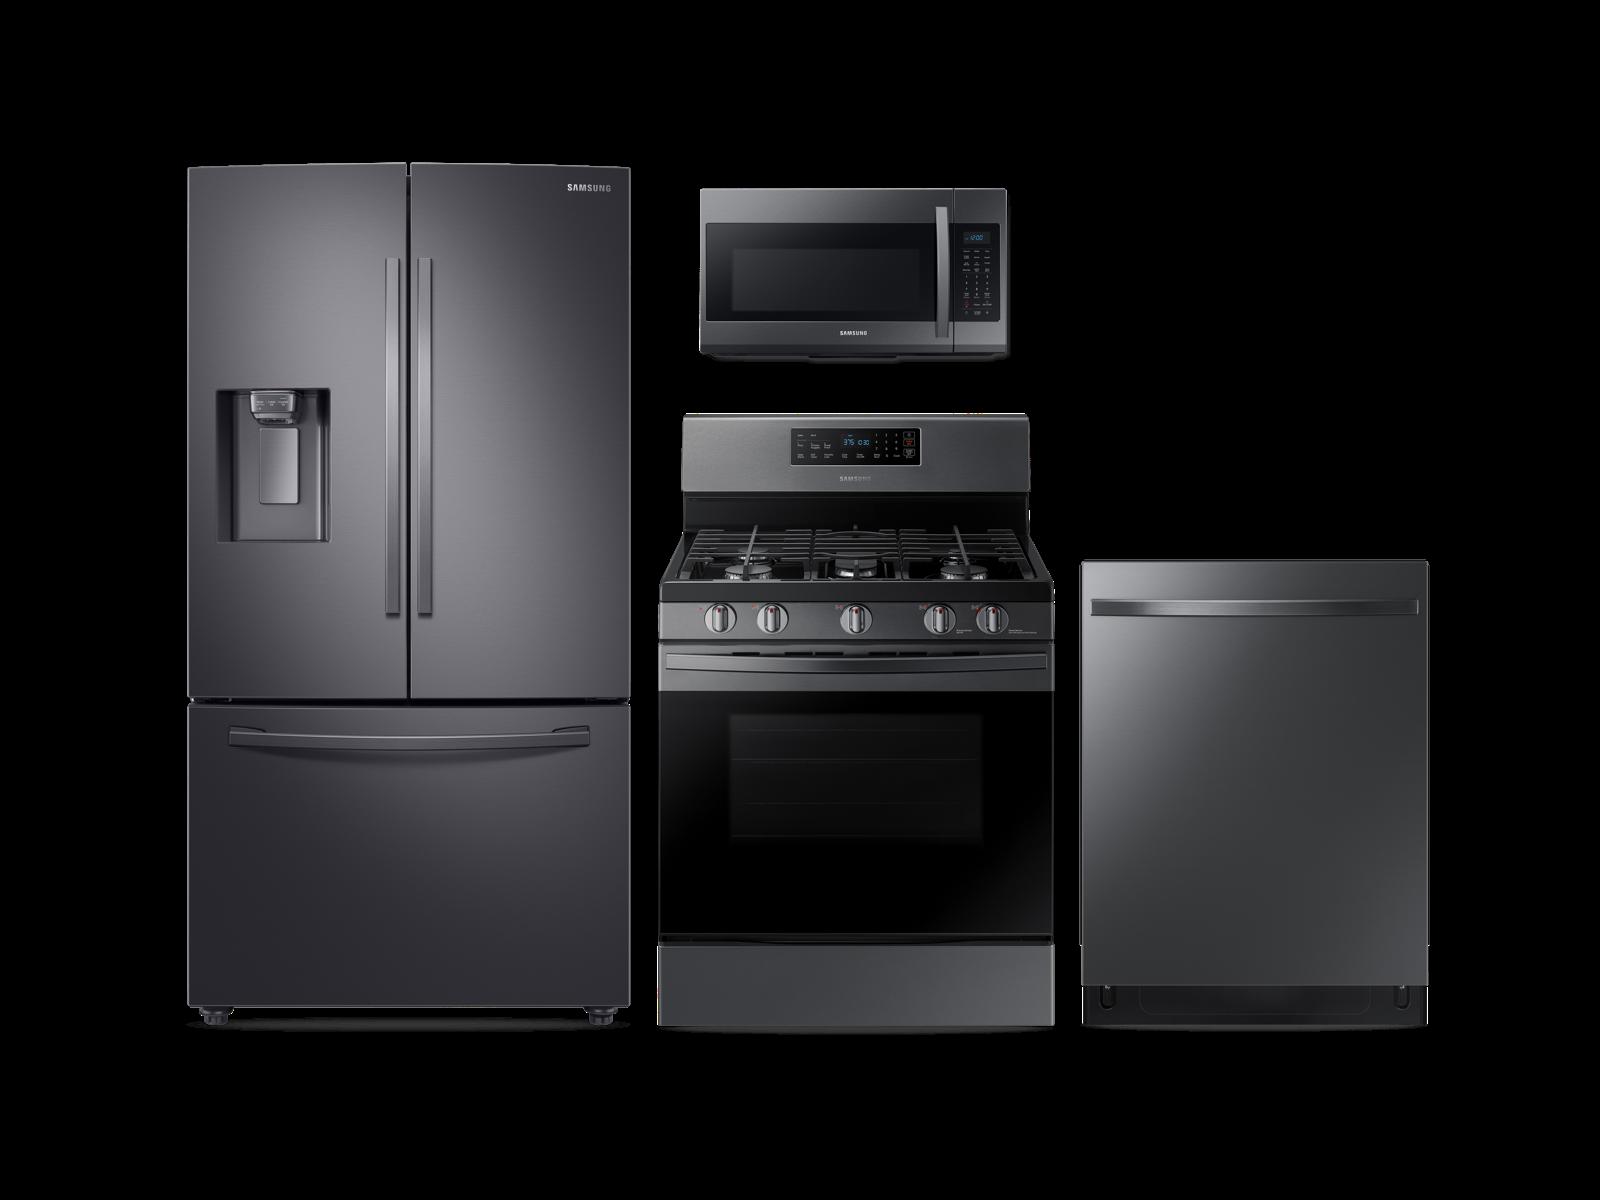 Samsung Large Capacity 3-door Refrigerator + Gas Range + StormWash Dishwasher + Microwave Kitchen Package in Black Stainless